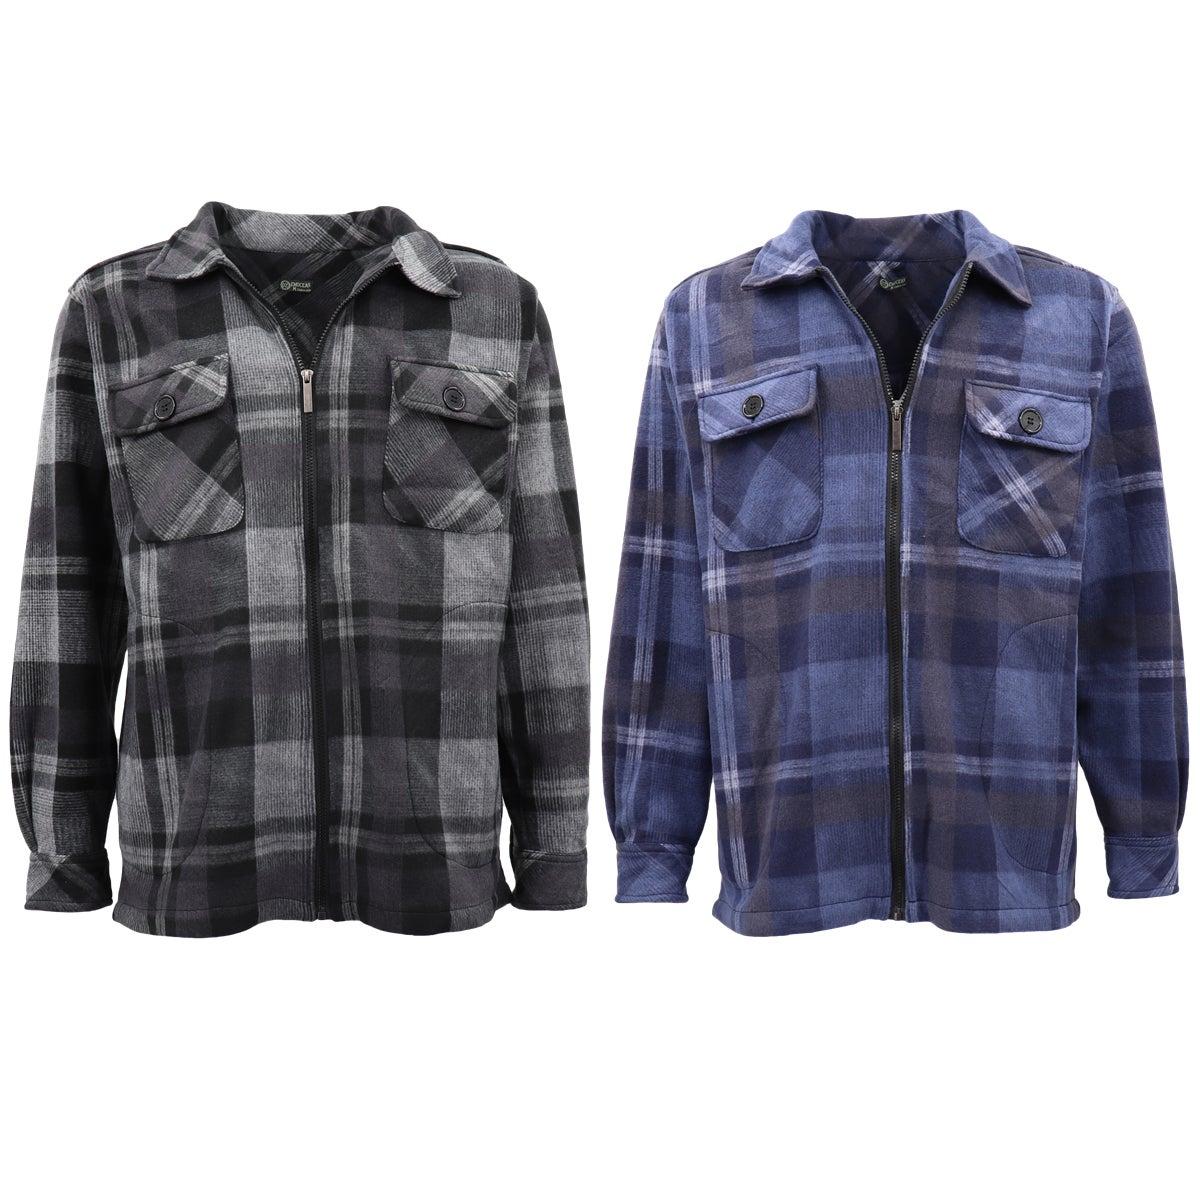 New Mens Long Sleeve Flannelette Shirt Premium Check Flannel Polar Fleece Jacket